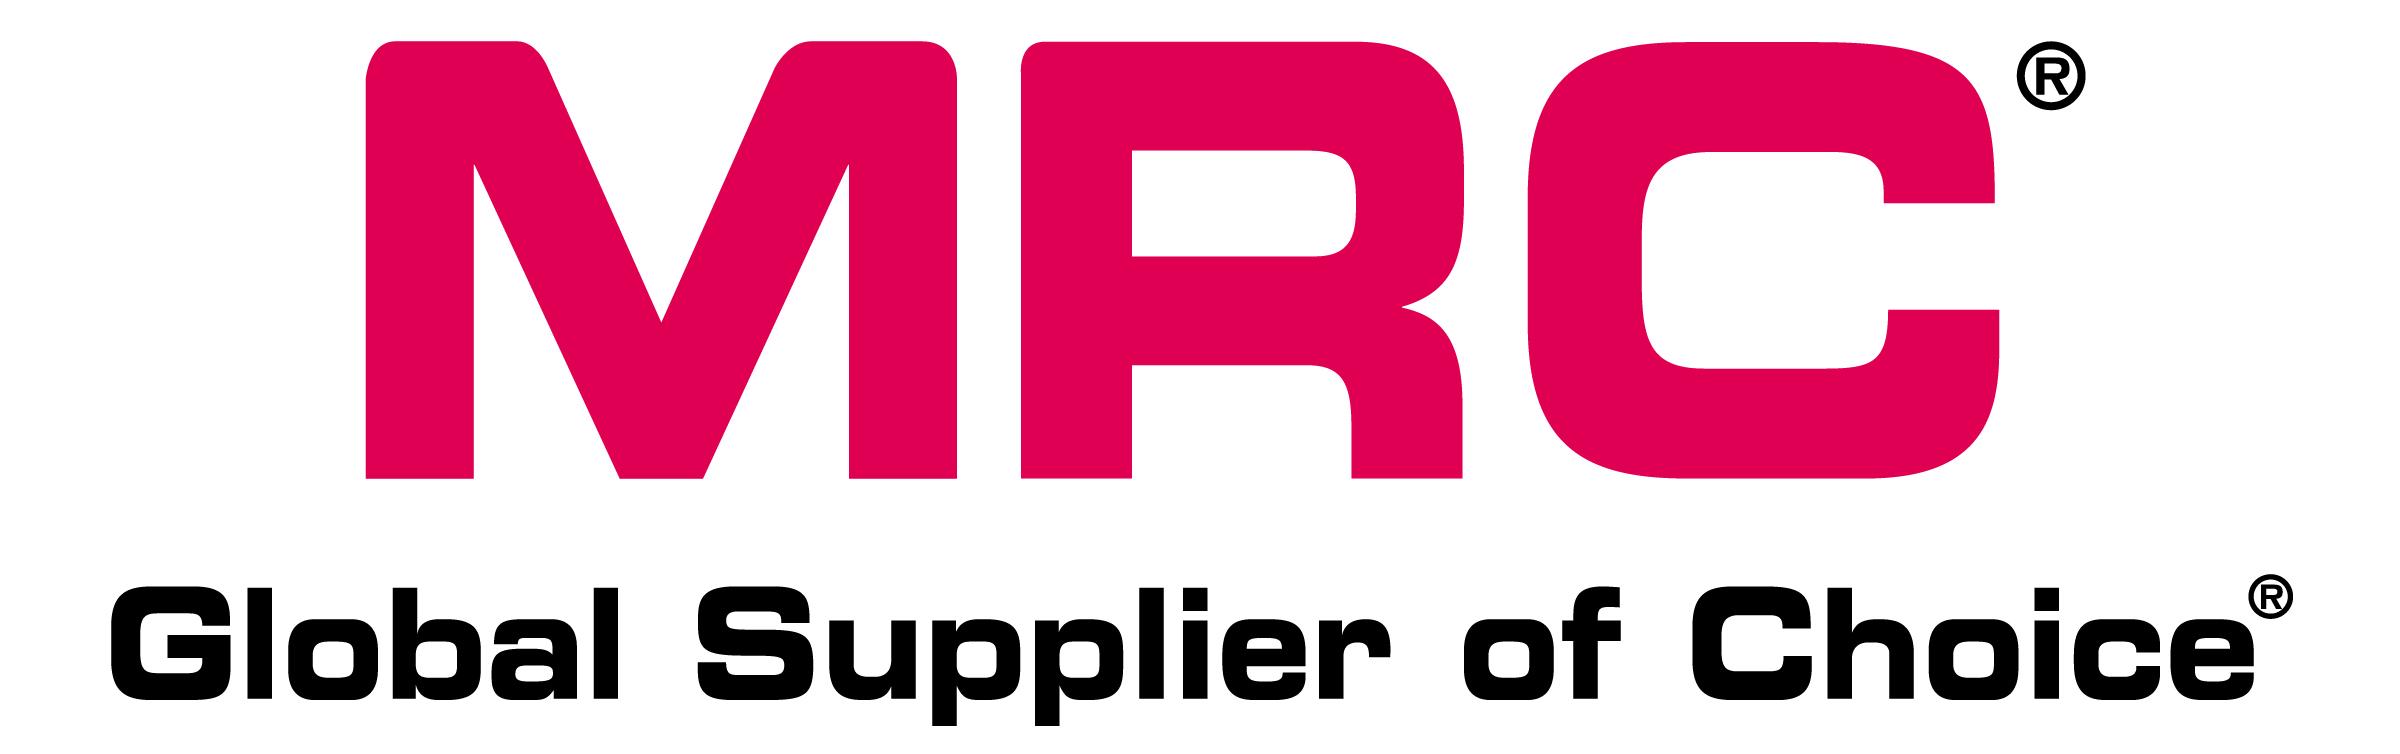 Gallery Image mrc_logo_1701r_hires.jpg